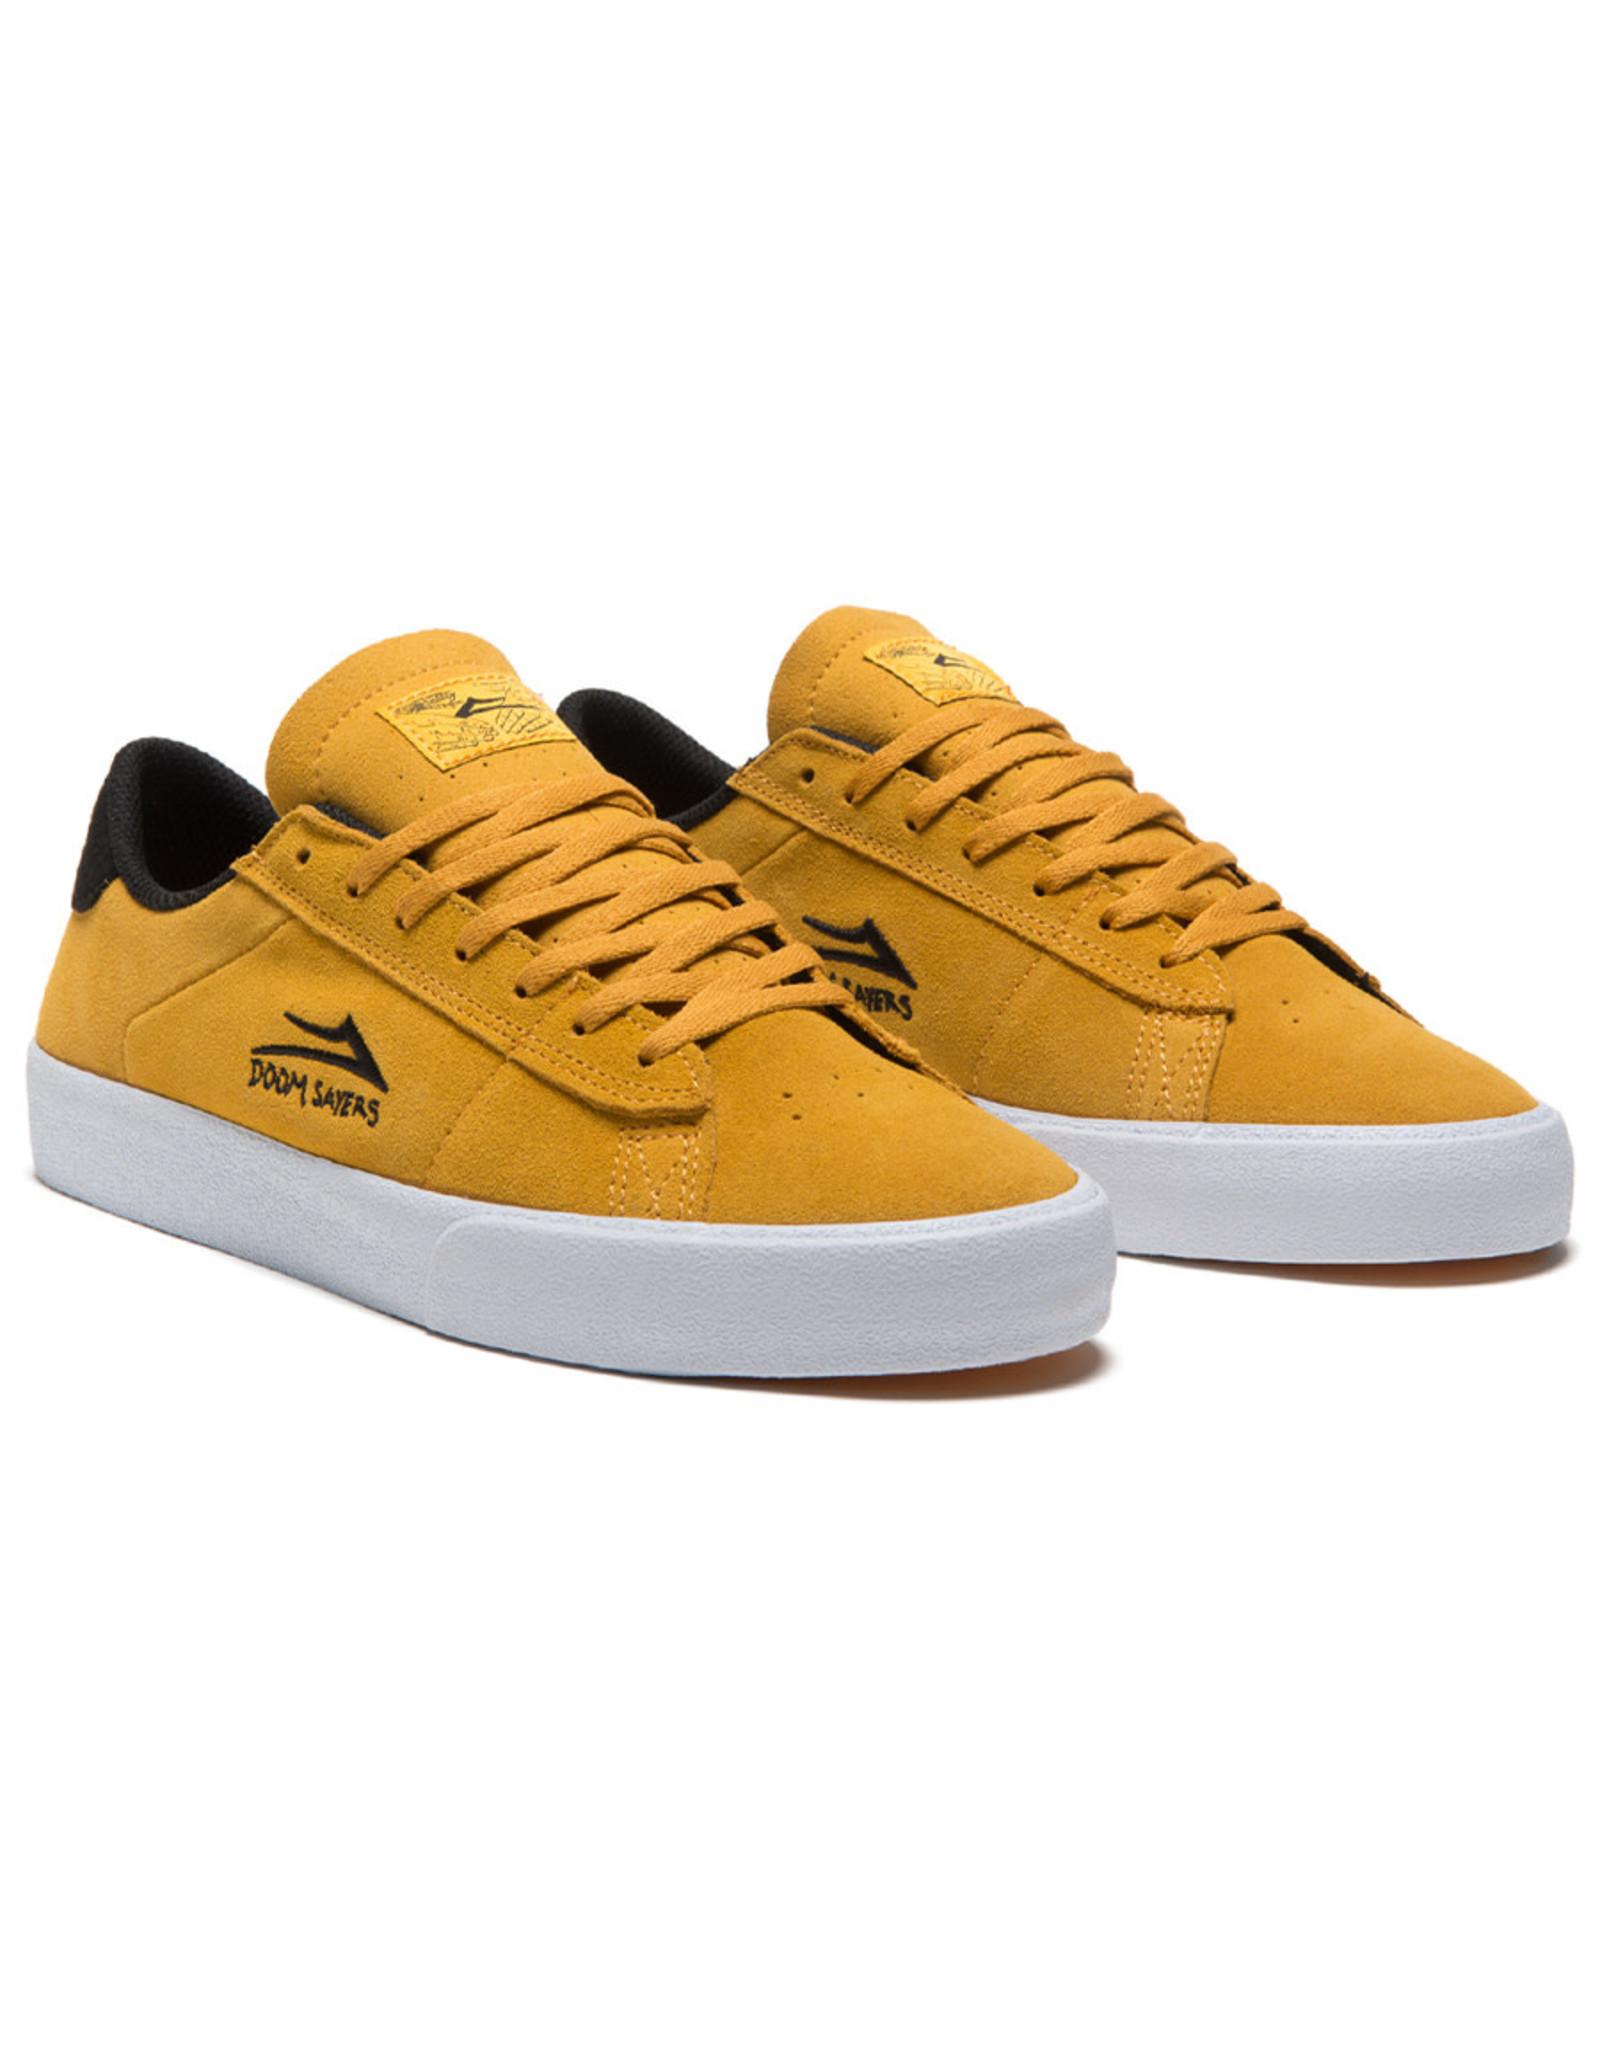 Lakai Shoes Lakai Shoe Newport Doom Sayers (Gold Suede)